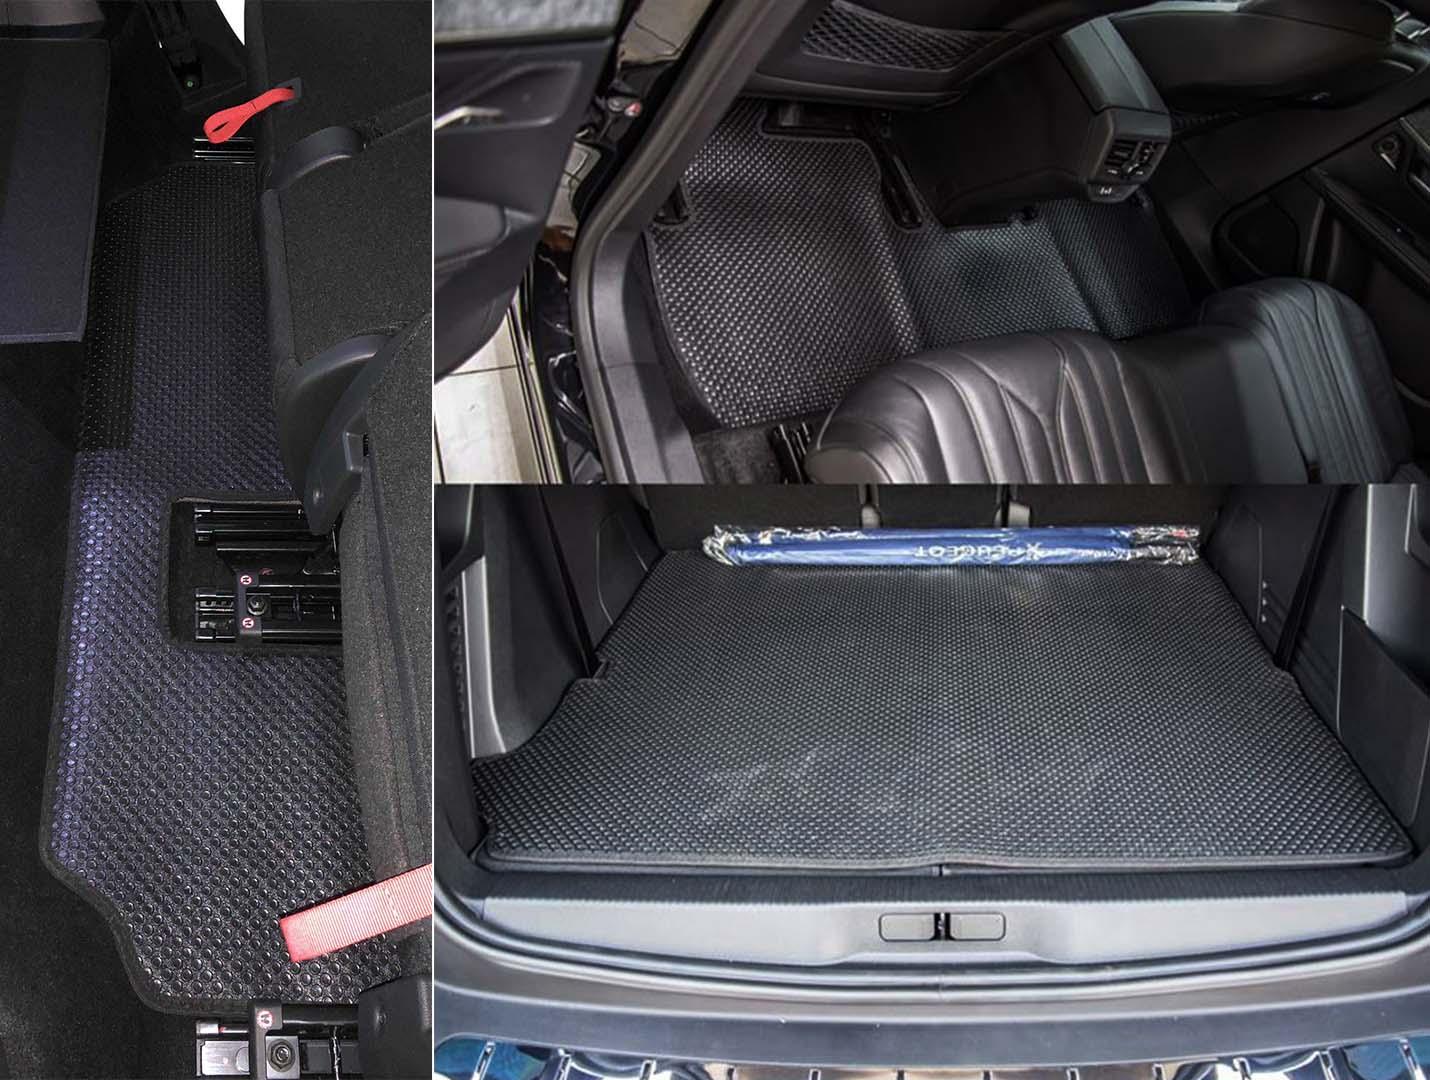 Thảm lót sàn Peugeot 5008 2020